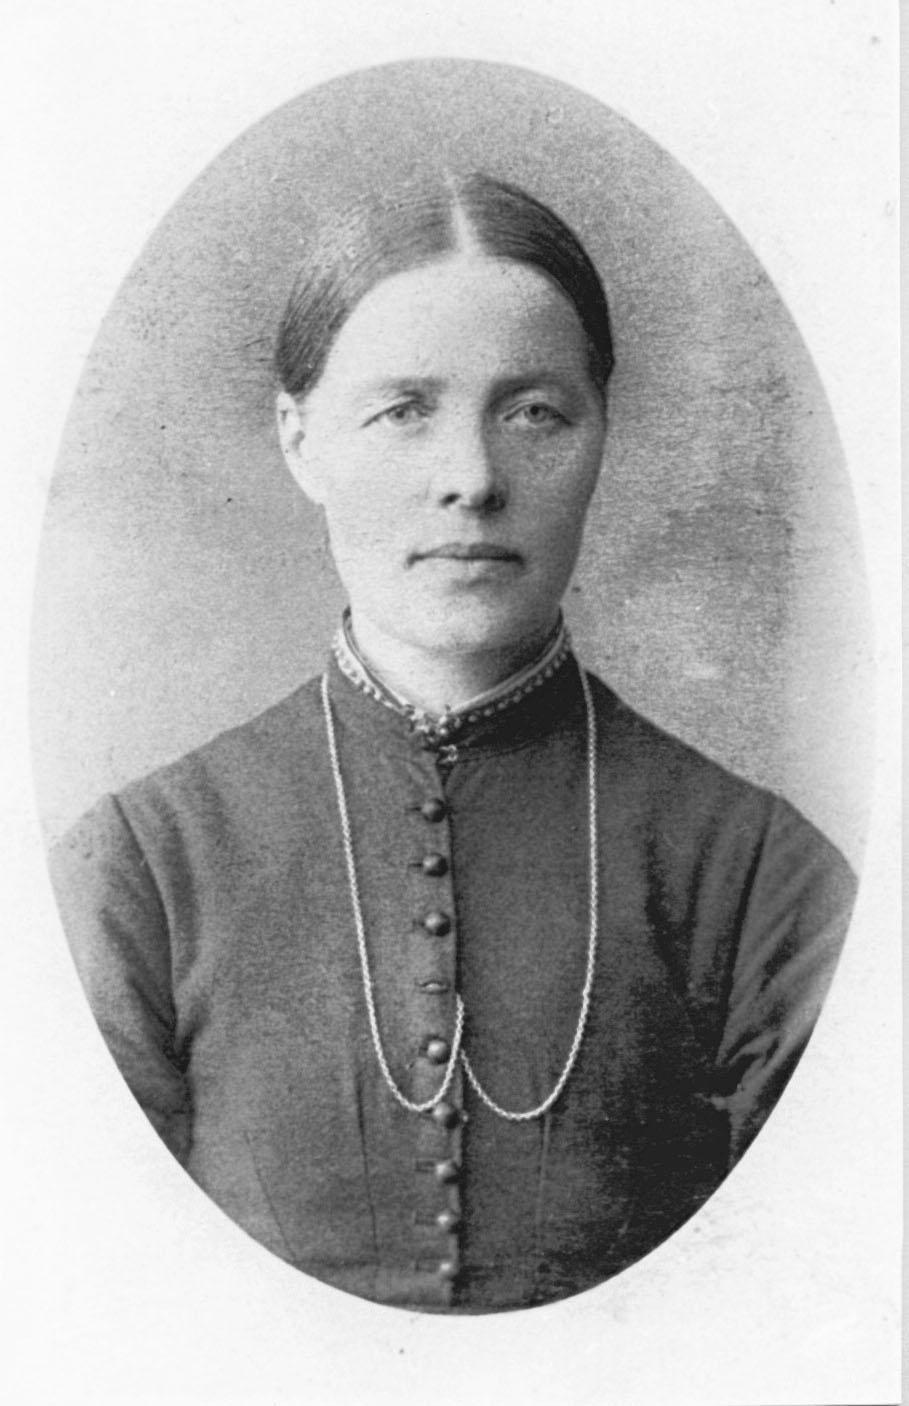 Ragnhild Frøysaa